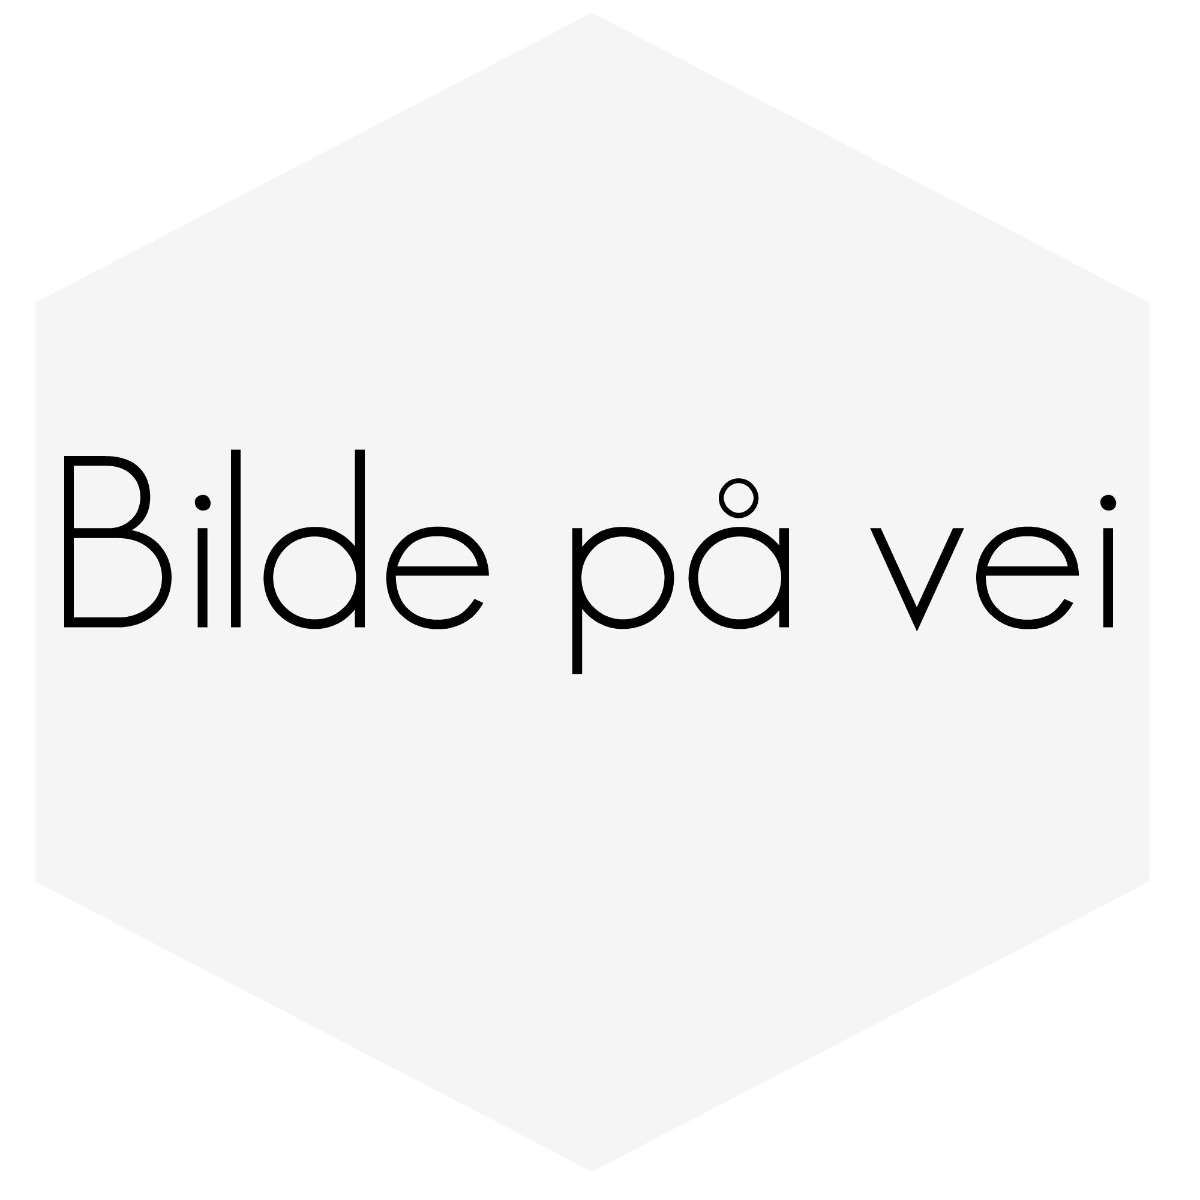 Foring likestrømsdynamo PV/Duett/Amazon,P1800 ++ stk pris